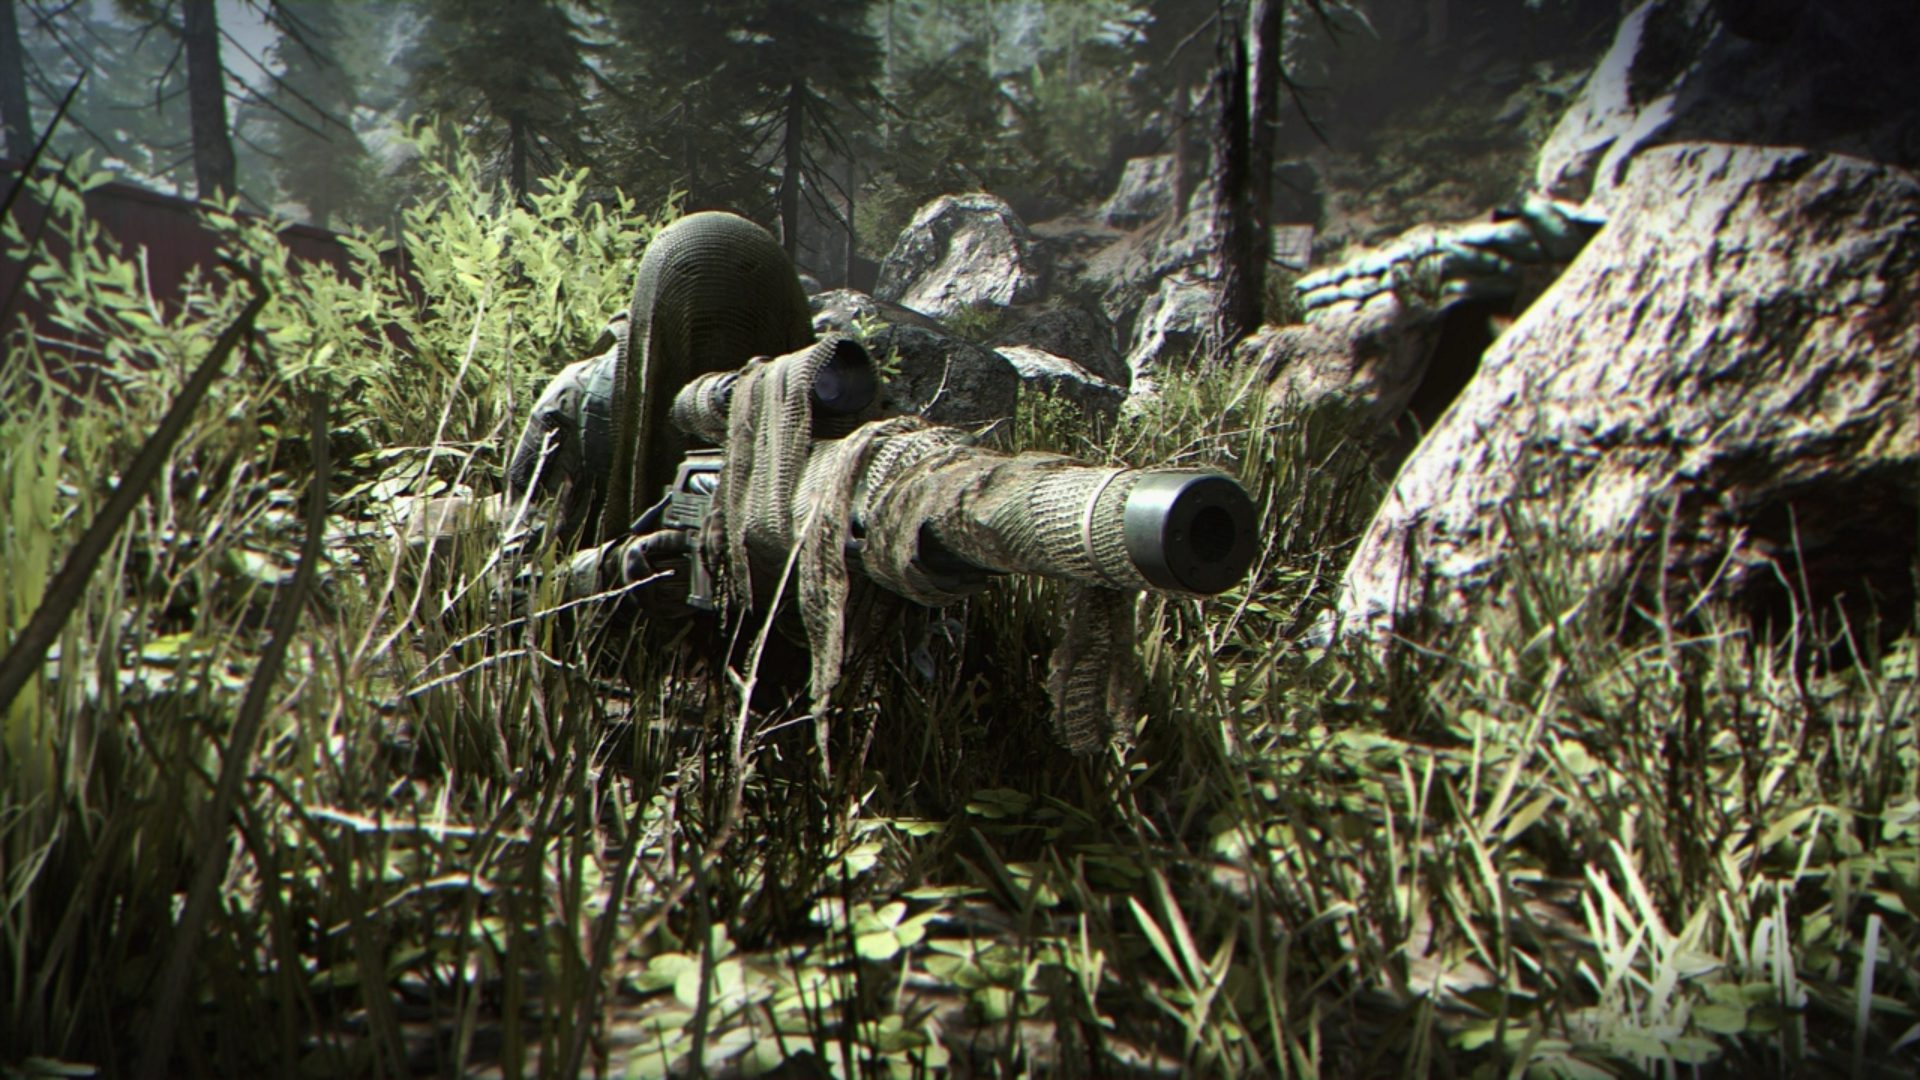 Call-of-Duty-Modern-Warfare-Ghillie-Suit.jpg